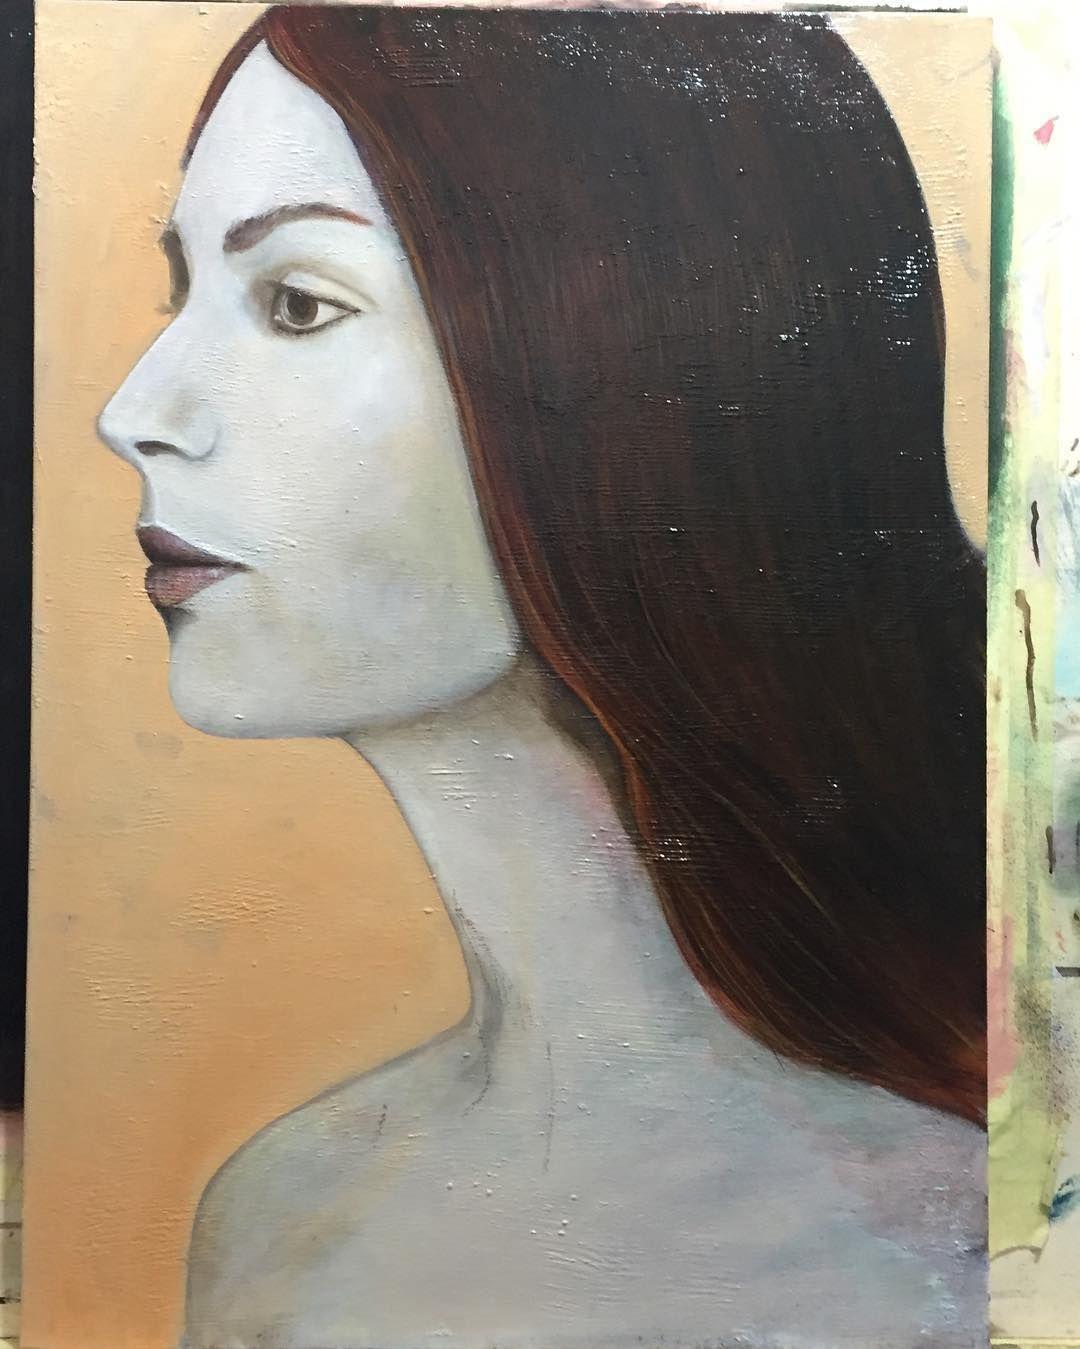 in progress... #paint #oilpainting #figure #portrait #artwork #painting #almazzaglia #beautiful